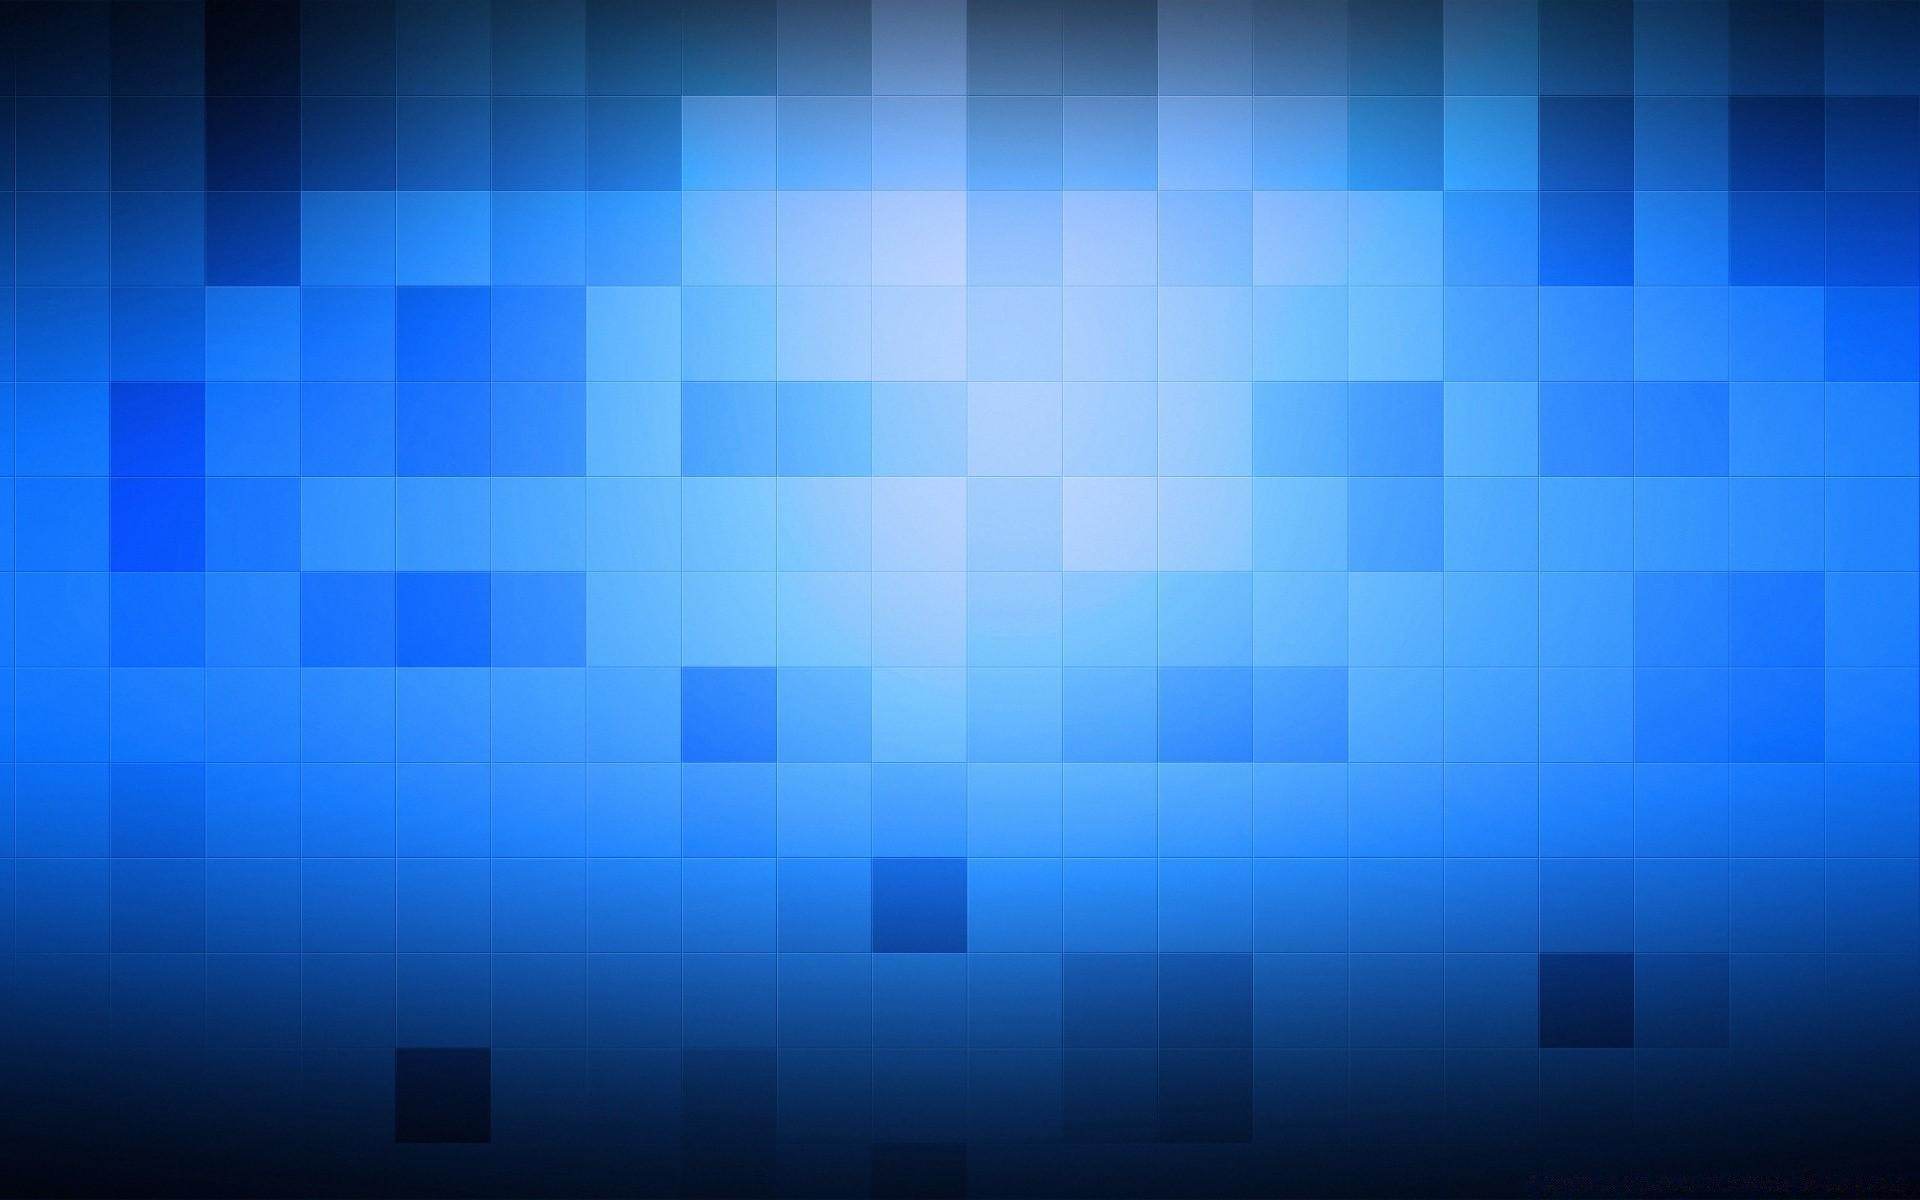 blue pixel desktop wallpapers for free